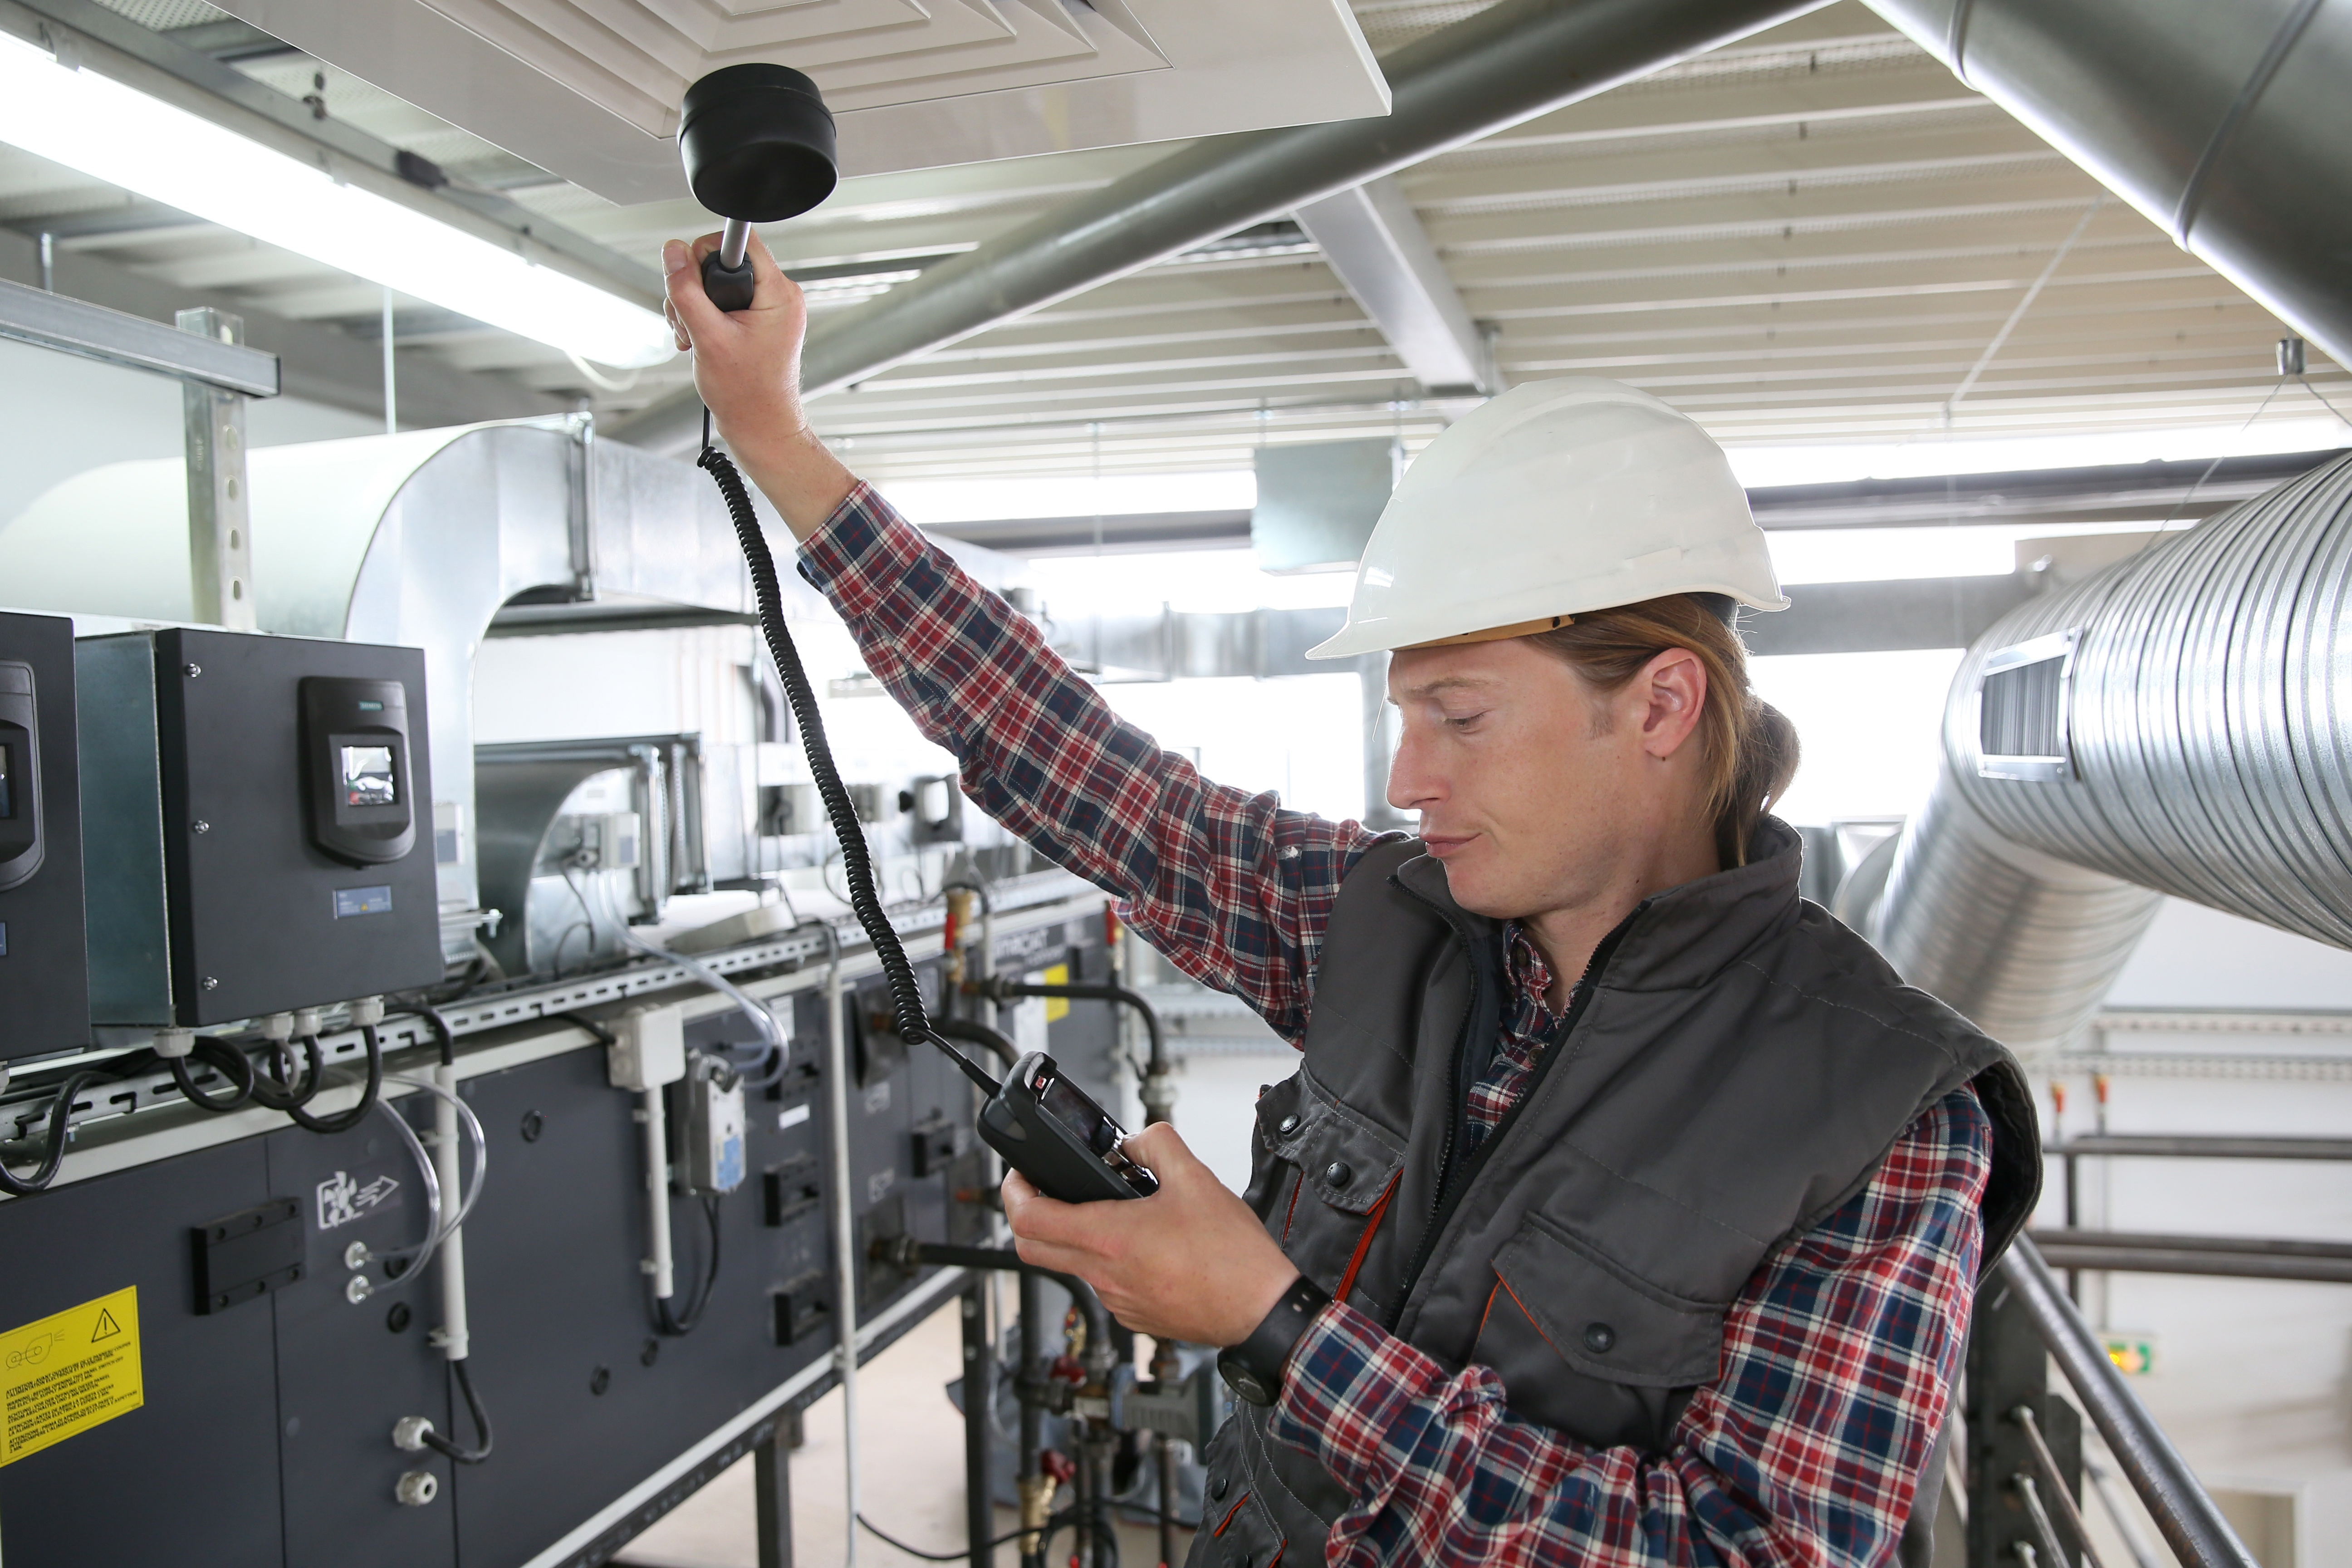 bigstock-Technician-controlling-air-qua-94062203.jpg